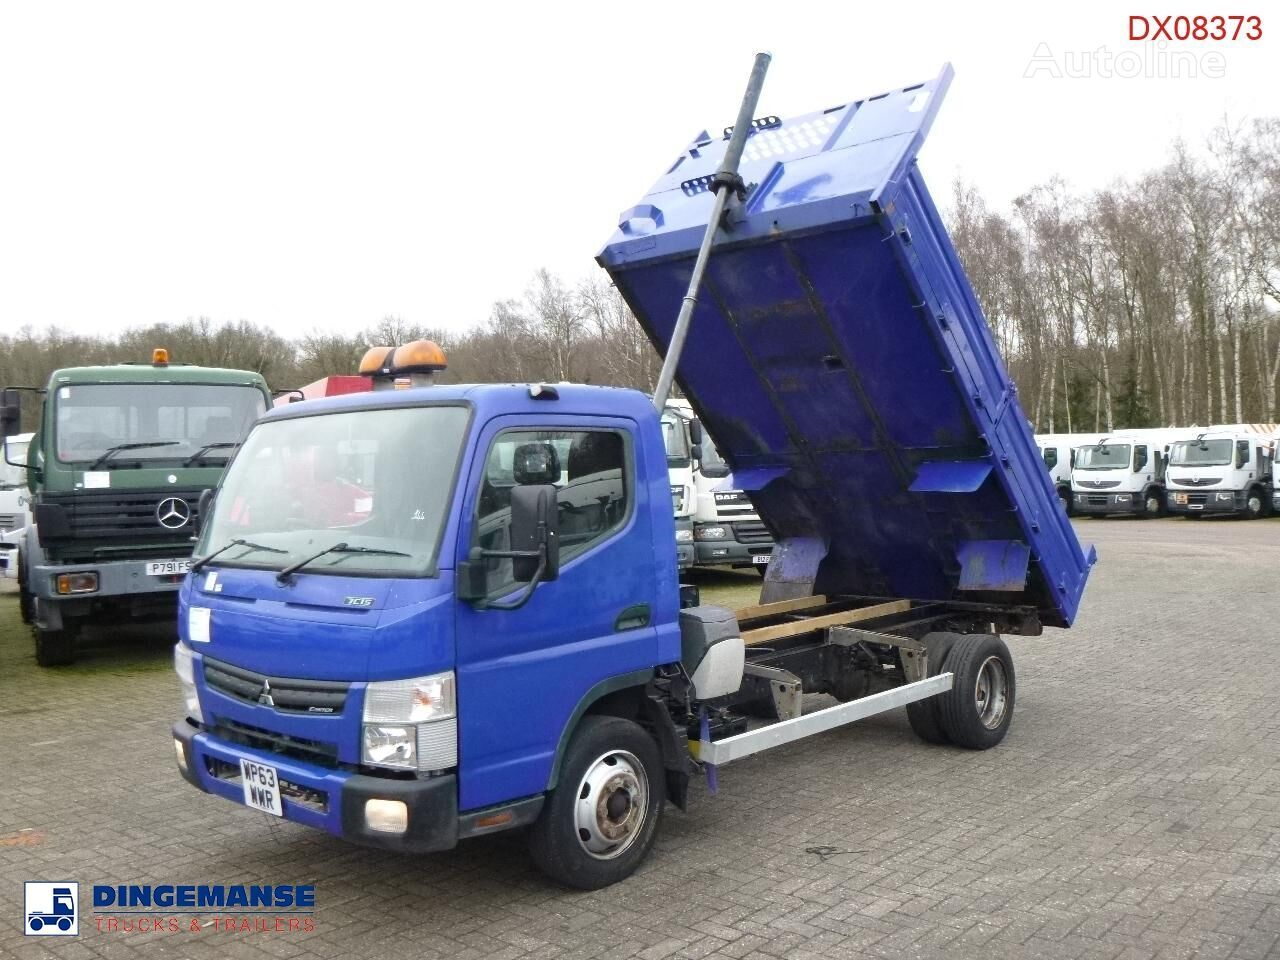 MITSUBISHI Fuso Canter 7C15 4x2 RHD tipper dump truck